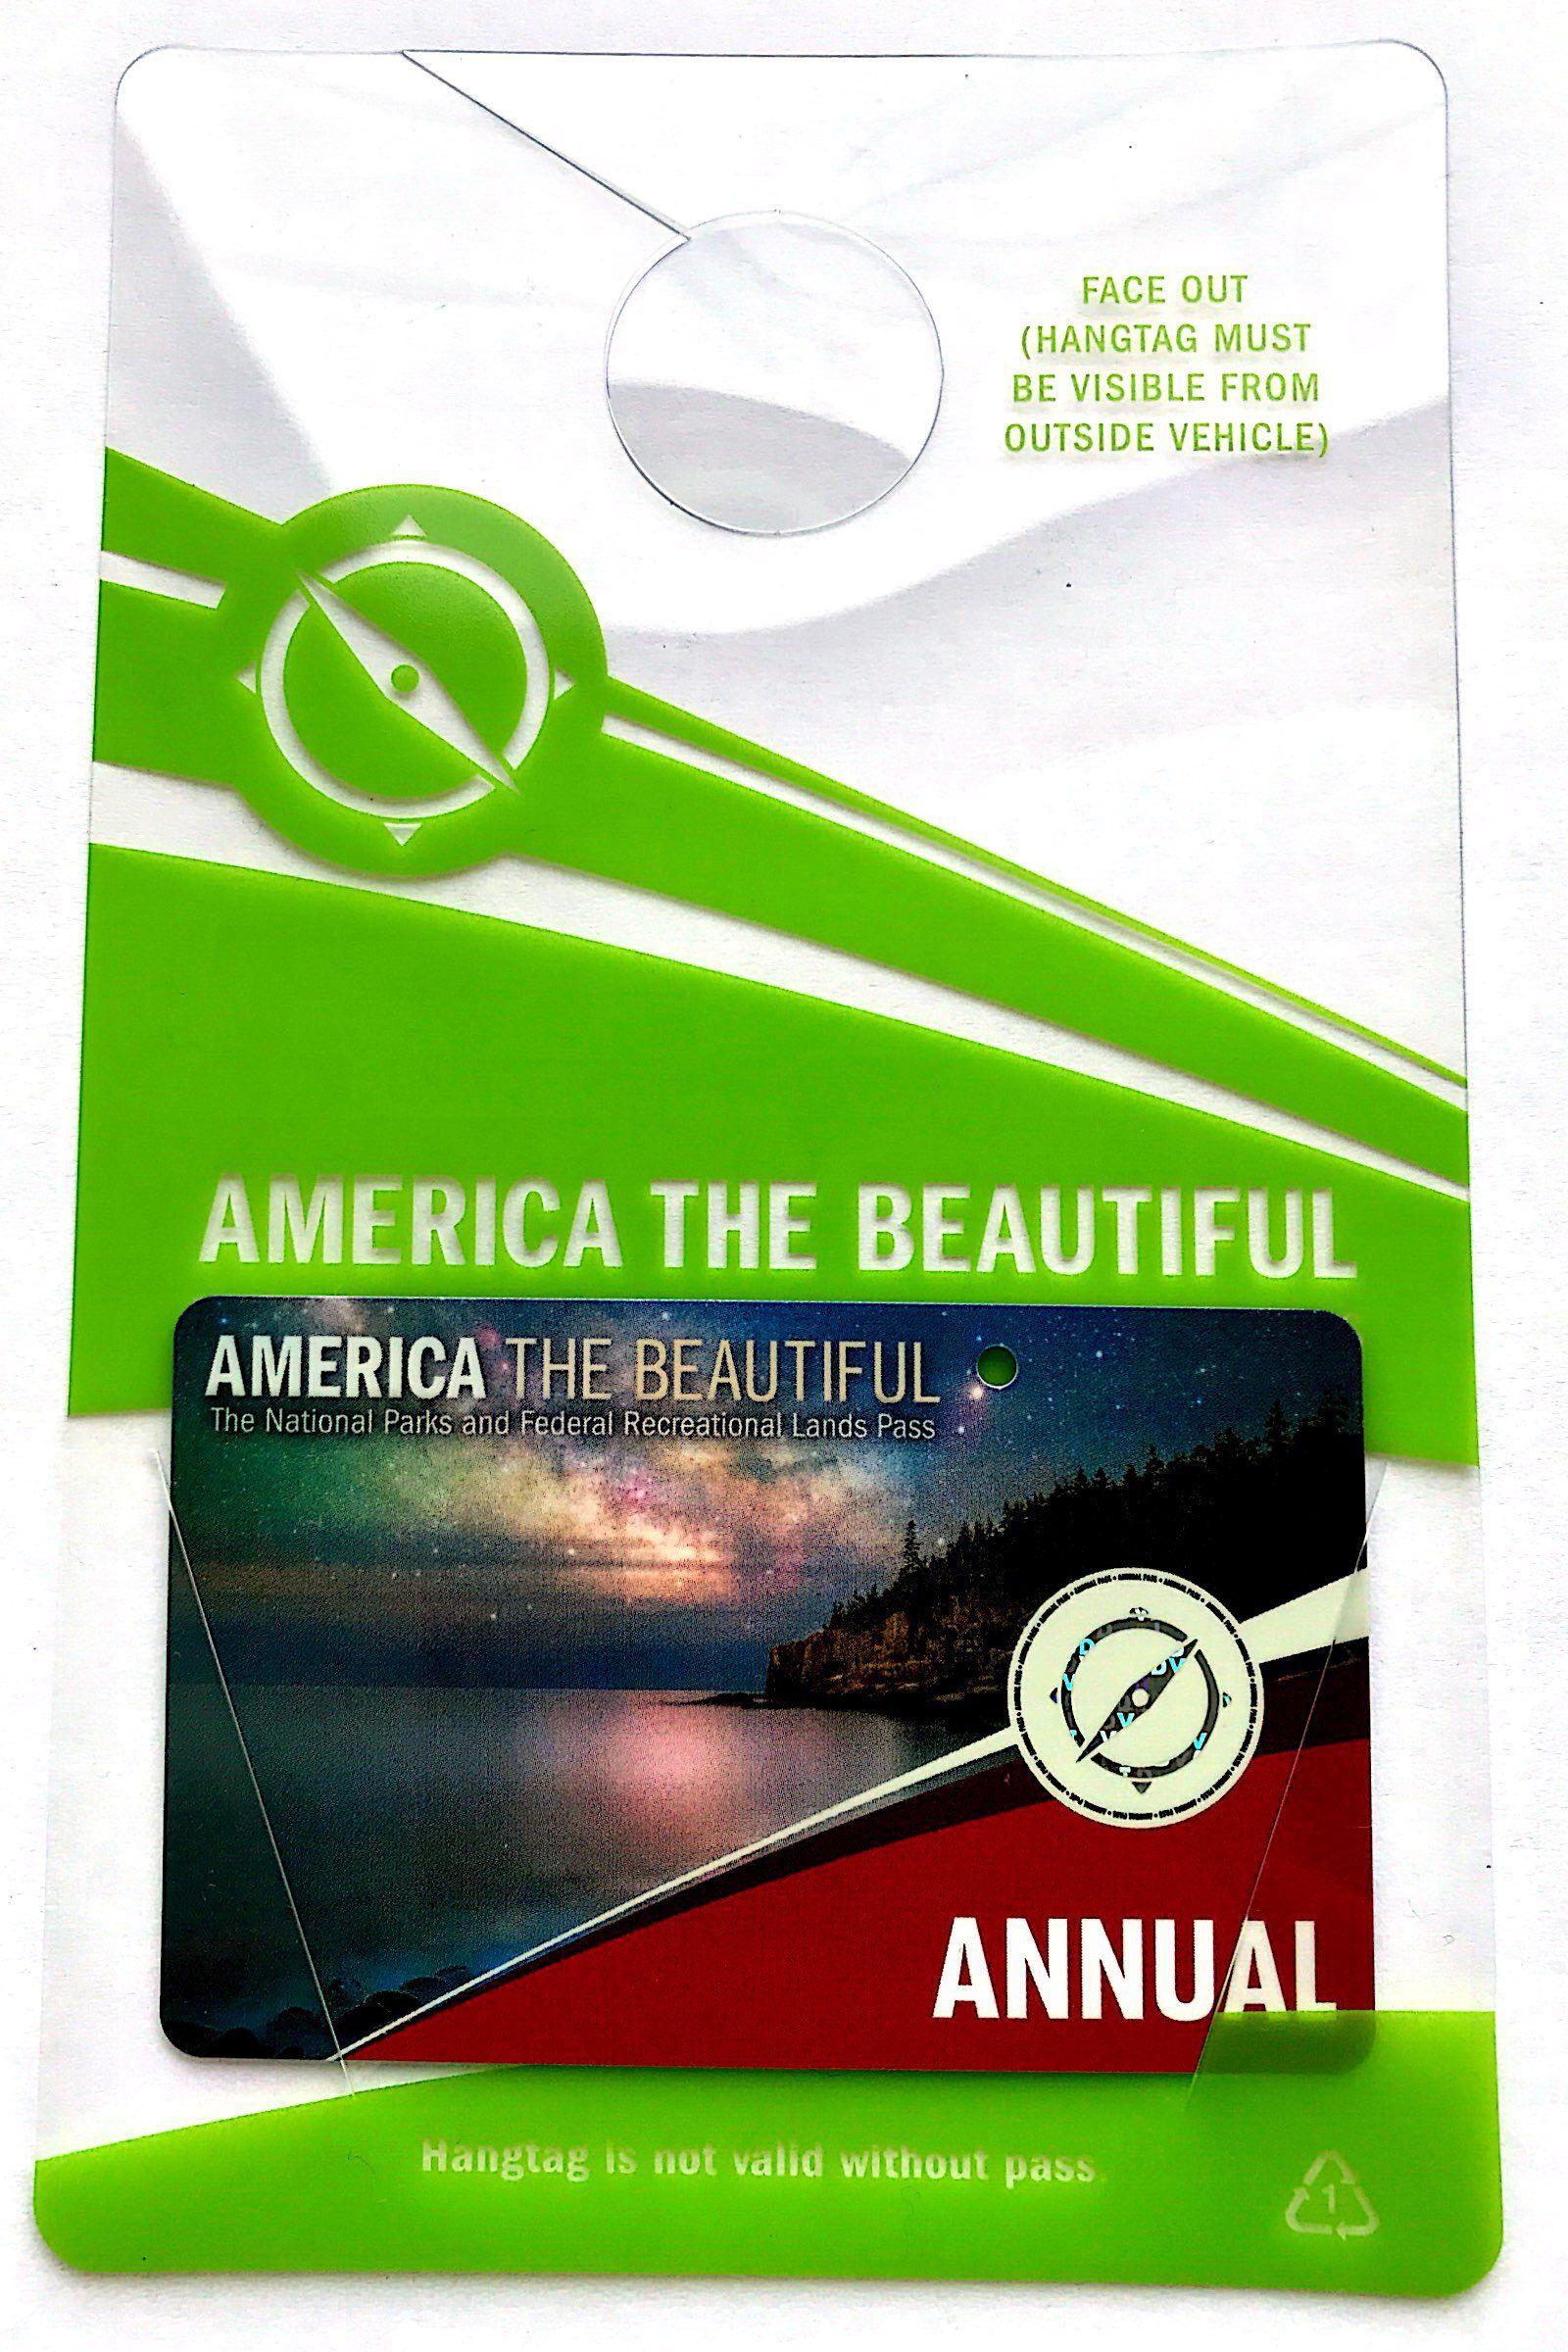 America The Beautiful National Park Pass Expires May 31 2022 In 2021 National Park Pass National Parks Us Park